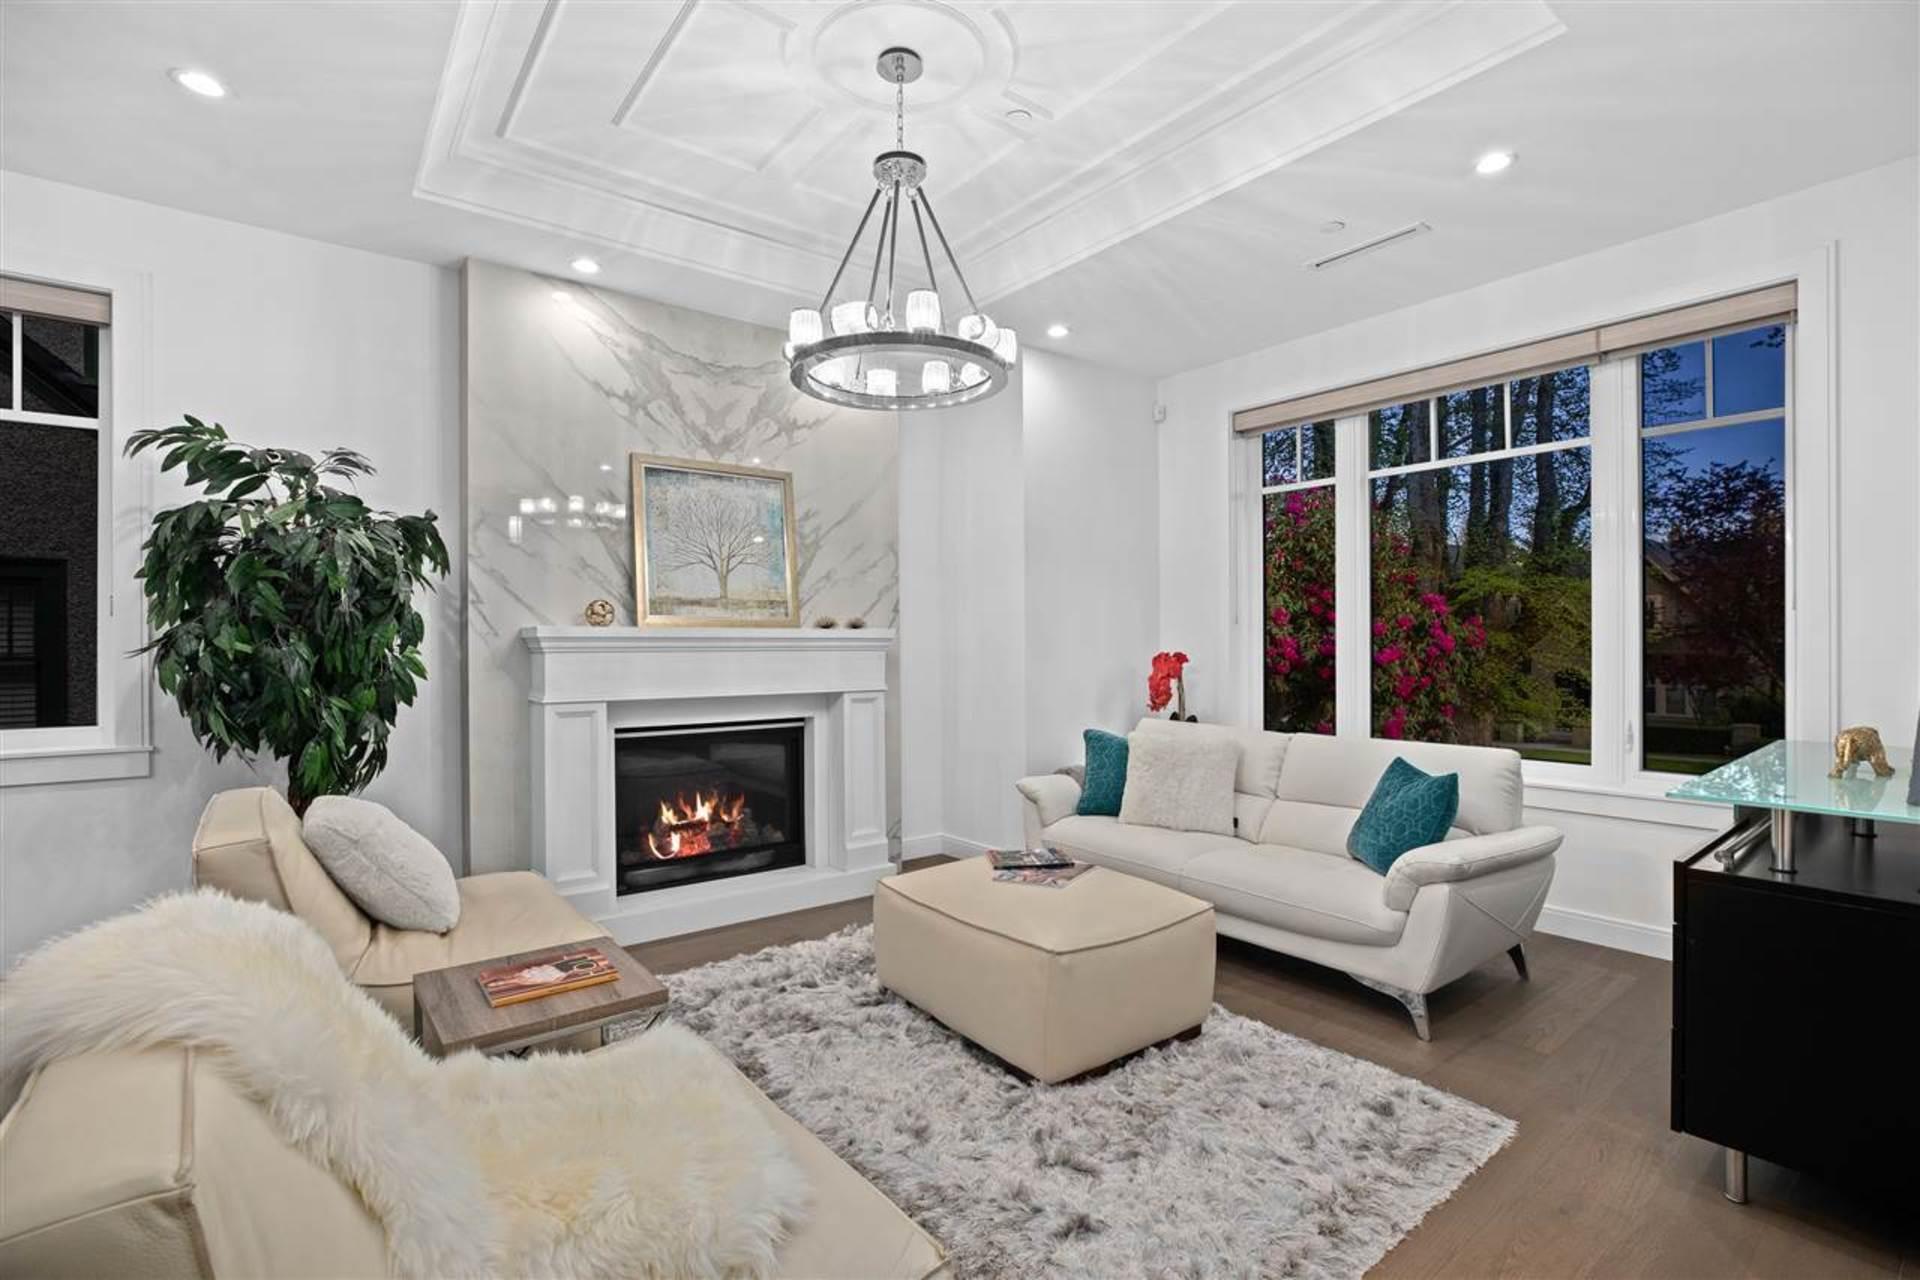 3707-w-37th-avenue-dunbar-vancouver-west-05 at 3707 W 37th Avenue, Dunbar, Vancouver West